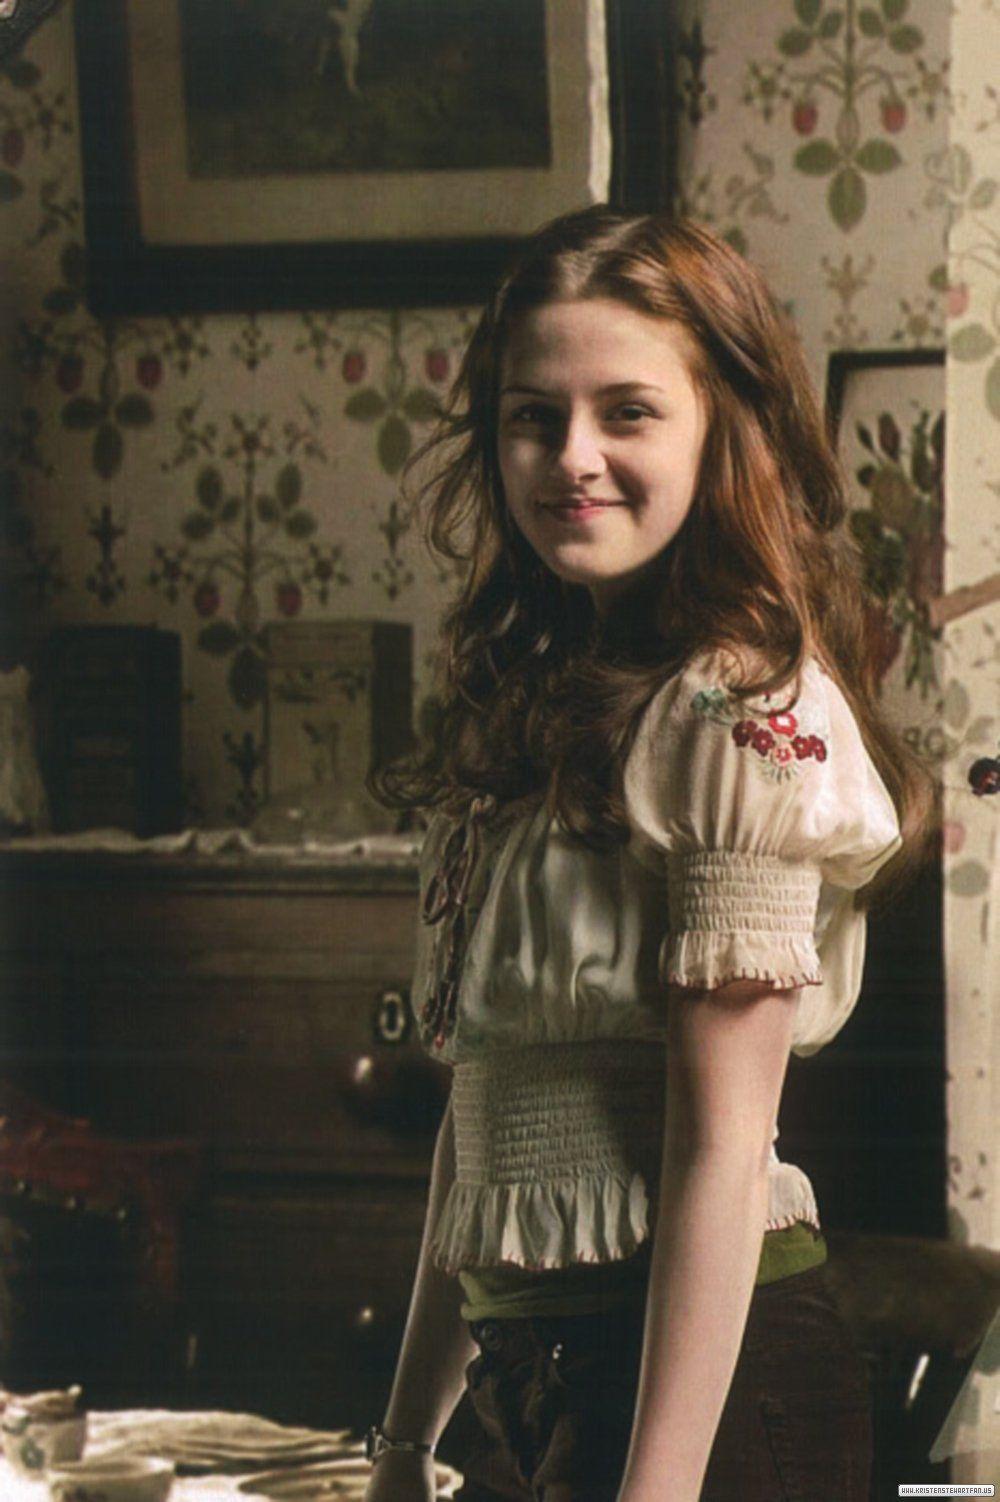 50b41cfd76b80 Kstew as Bella Swan   Movies in 2019   Twilight 2008, Bella swan ...